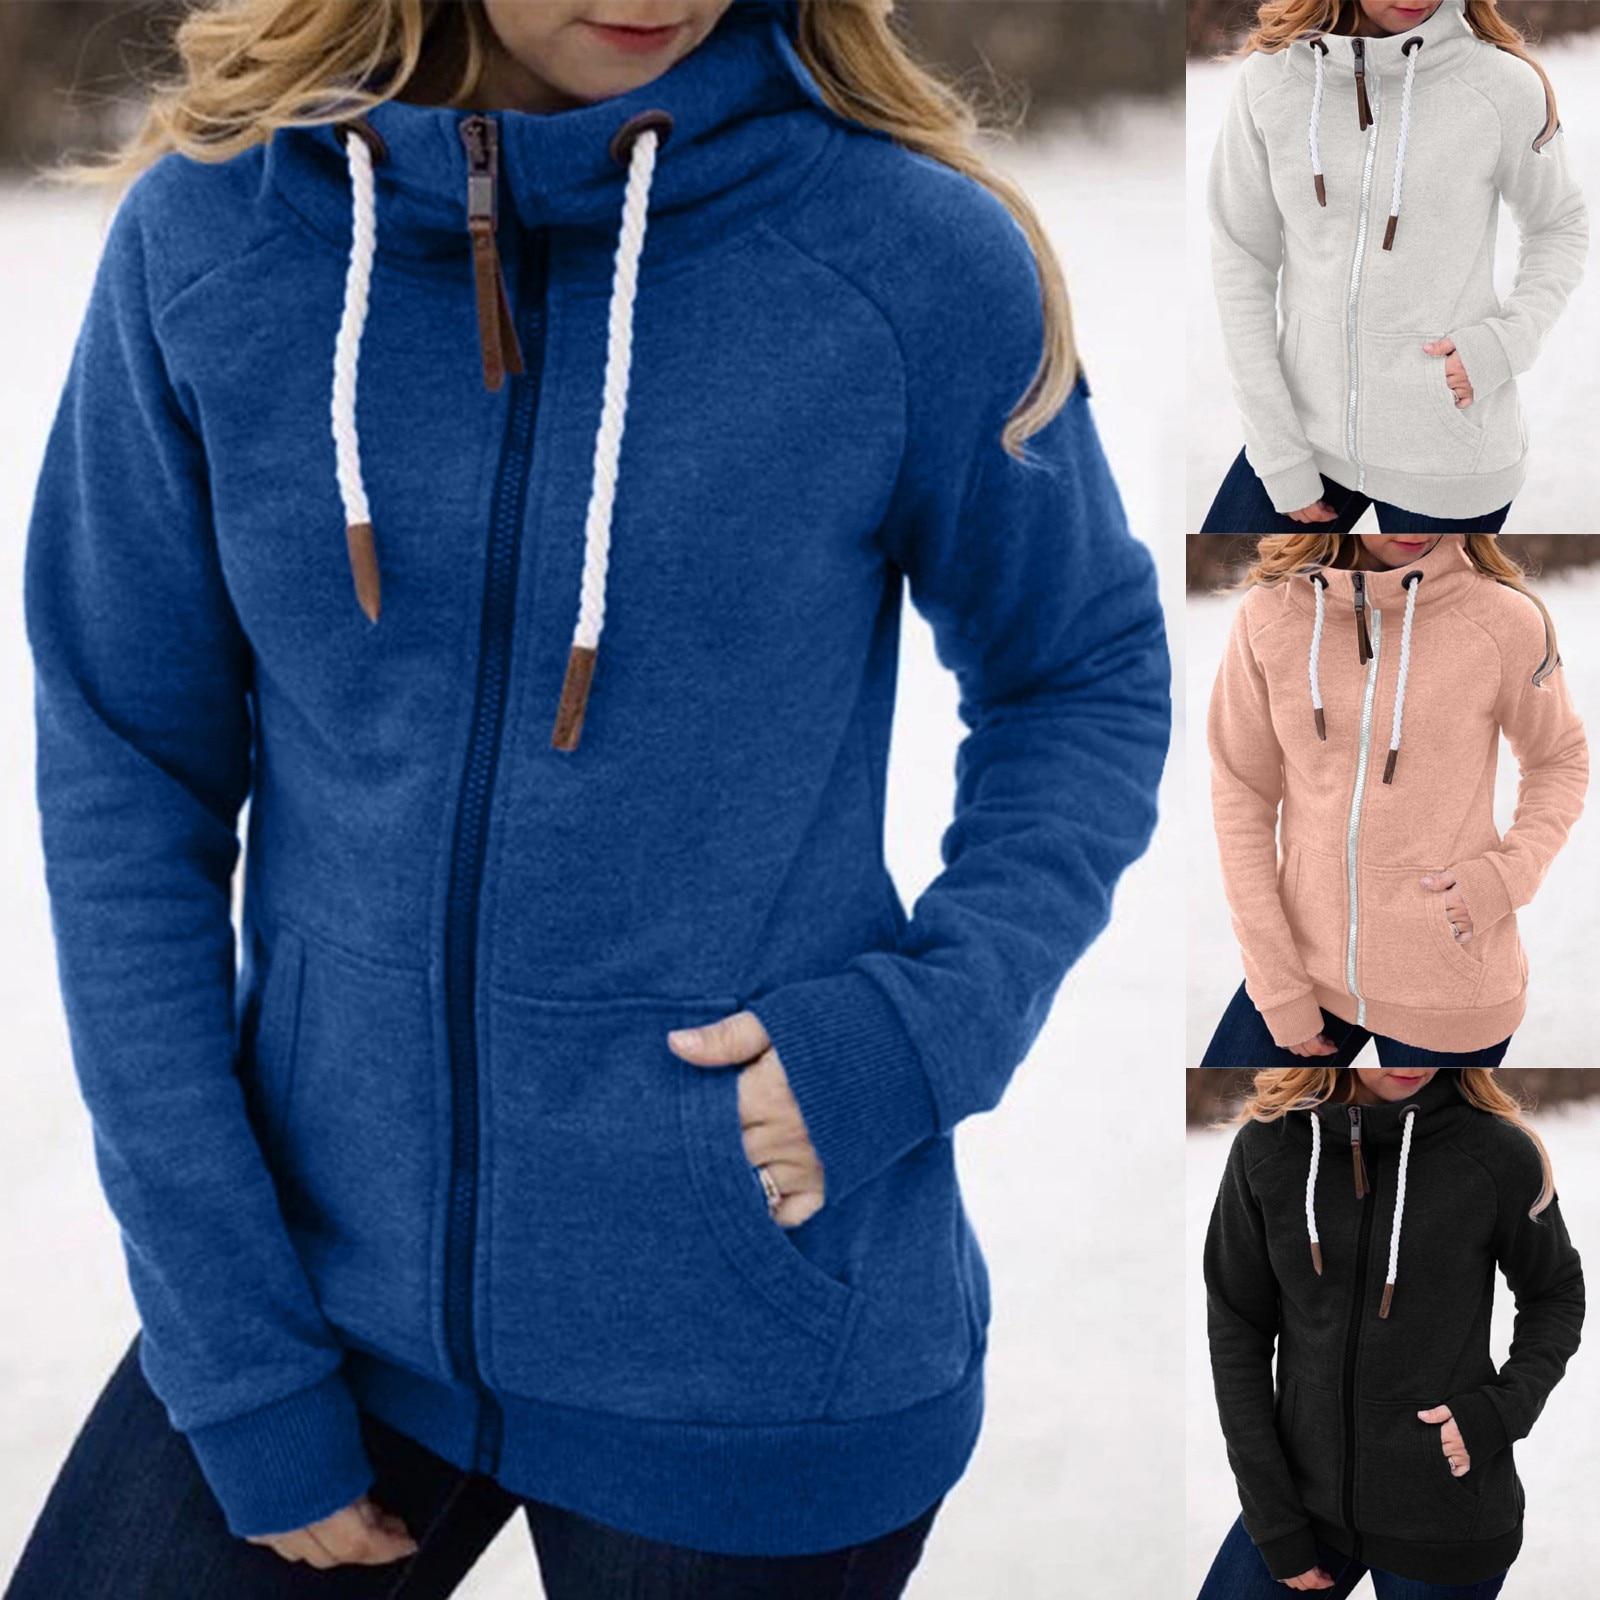 Permalink to Women Fashion Solid Jacket Zipper Pocket Sweatshirt Long Sleeve Coat Loose Solid Color Hooded Sweatshirt Платье Женское Осень